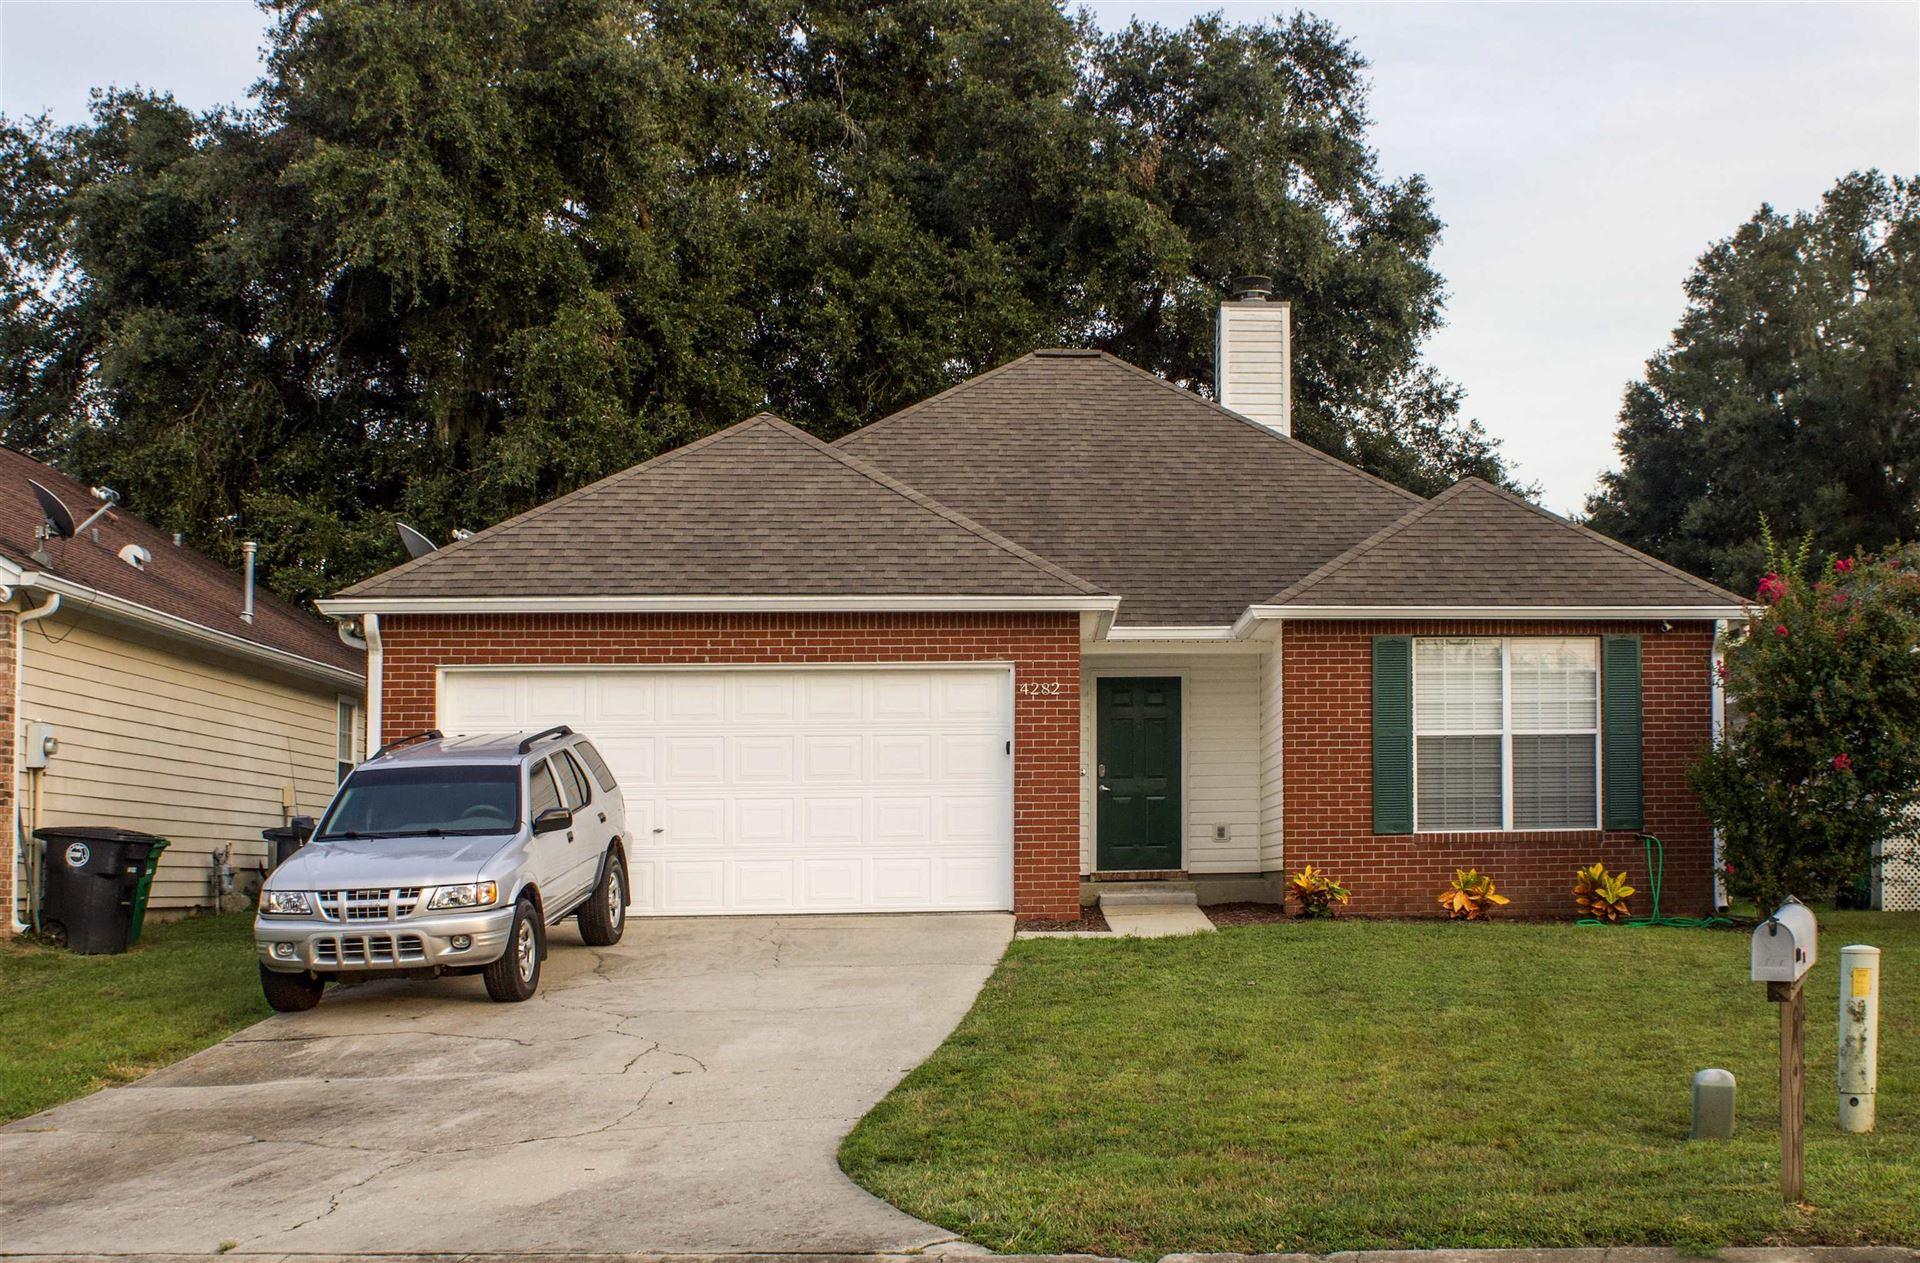 Photo of 4282 Little Osprey Drive, TALLAHASSEE, FL 32311 (MLS # 337324)